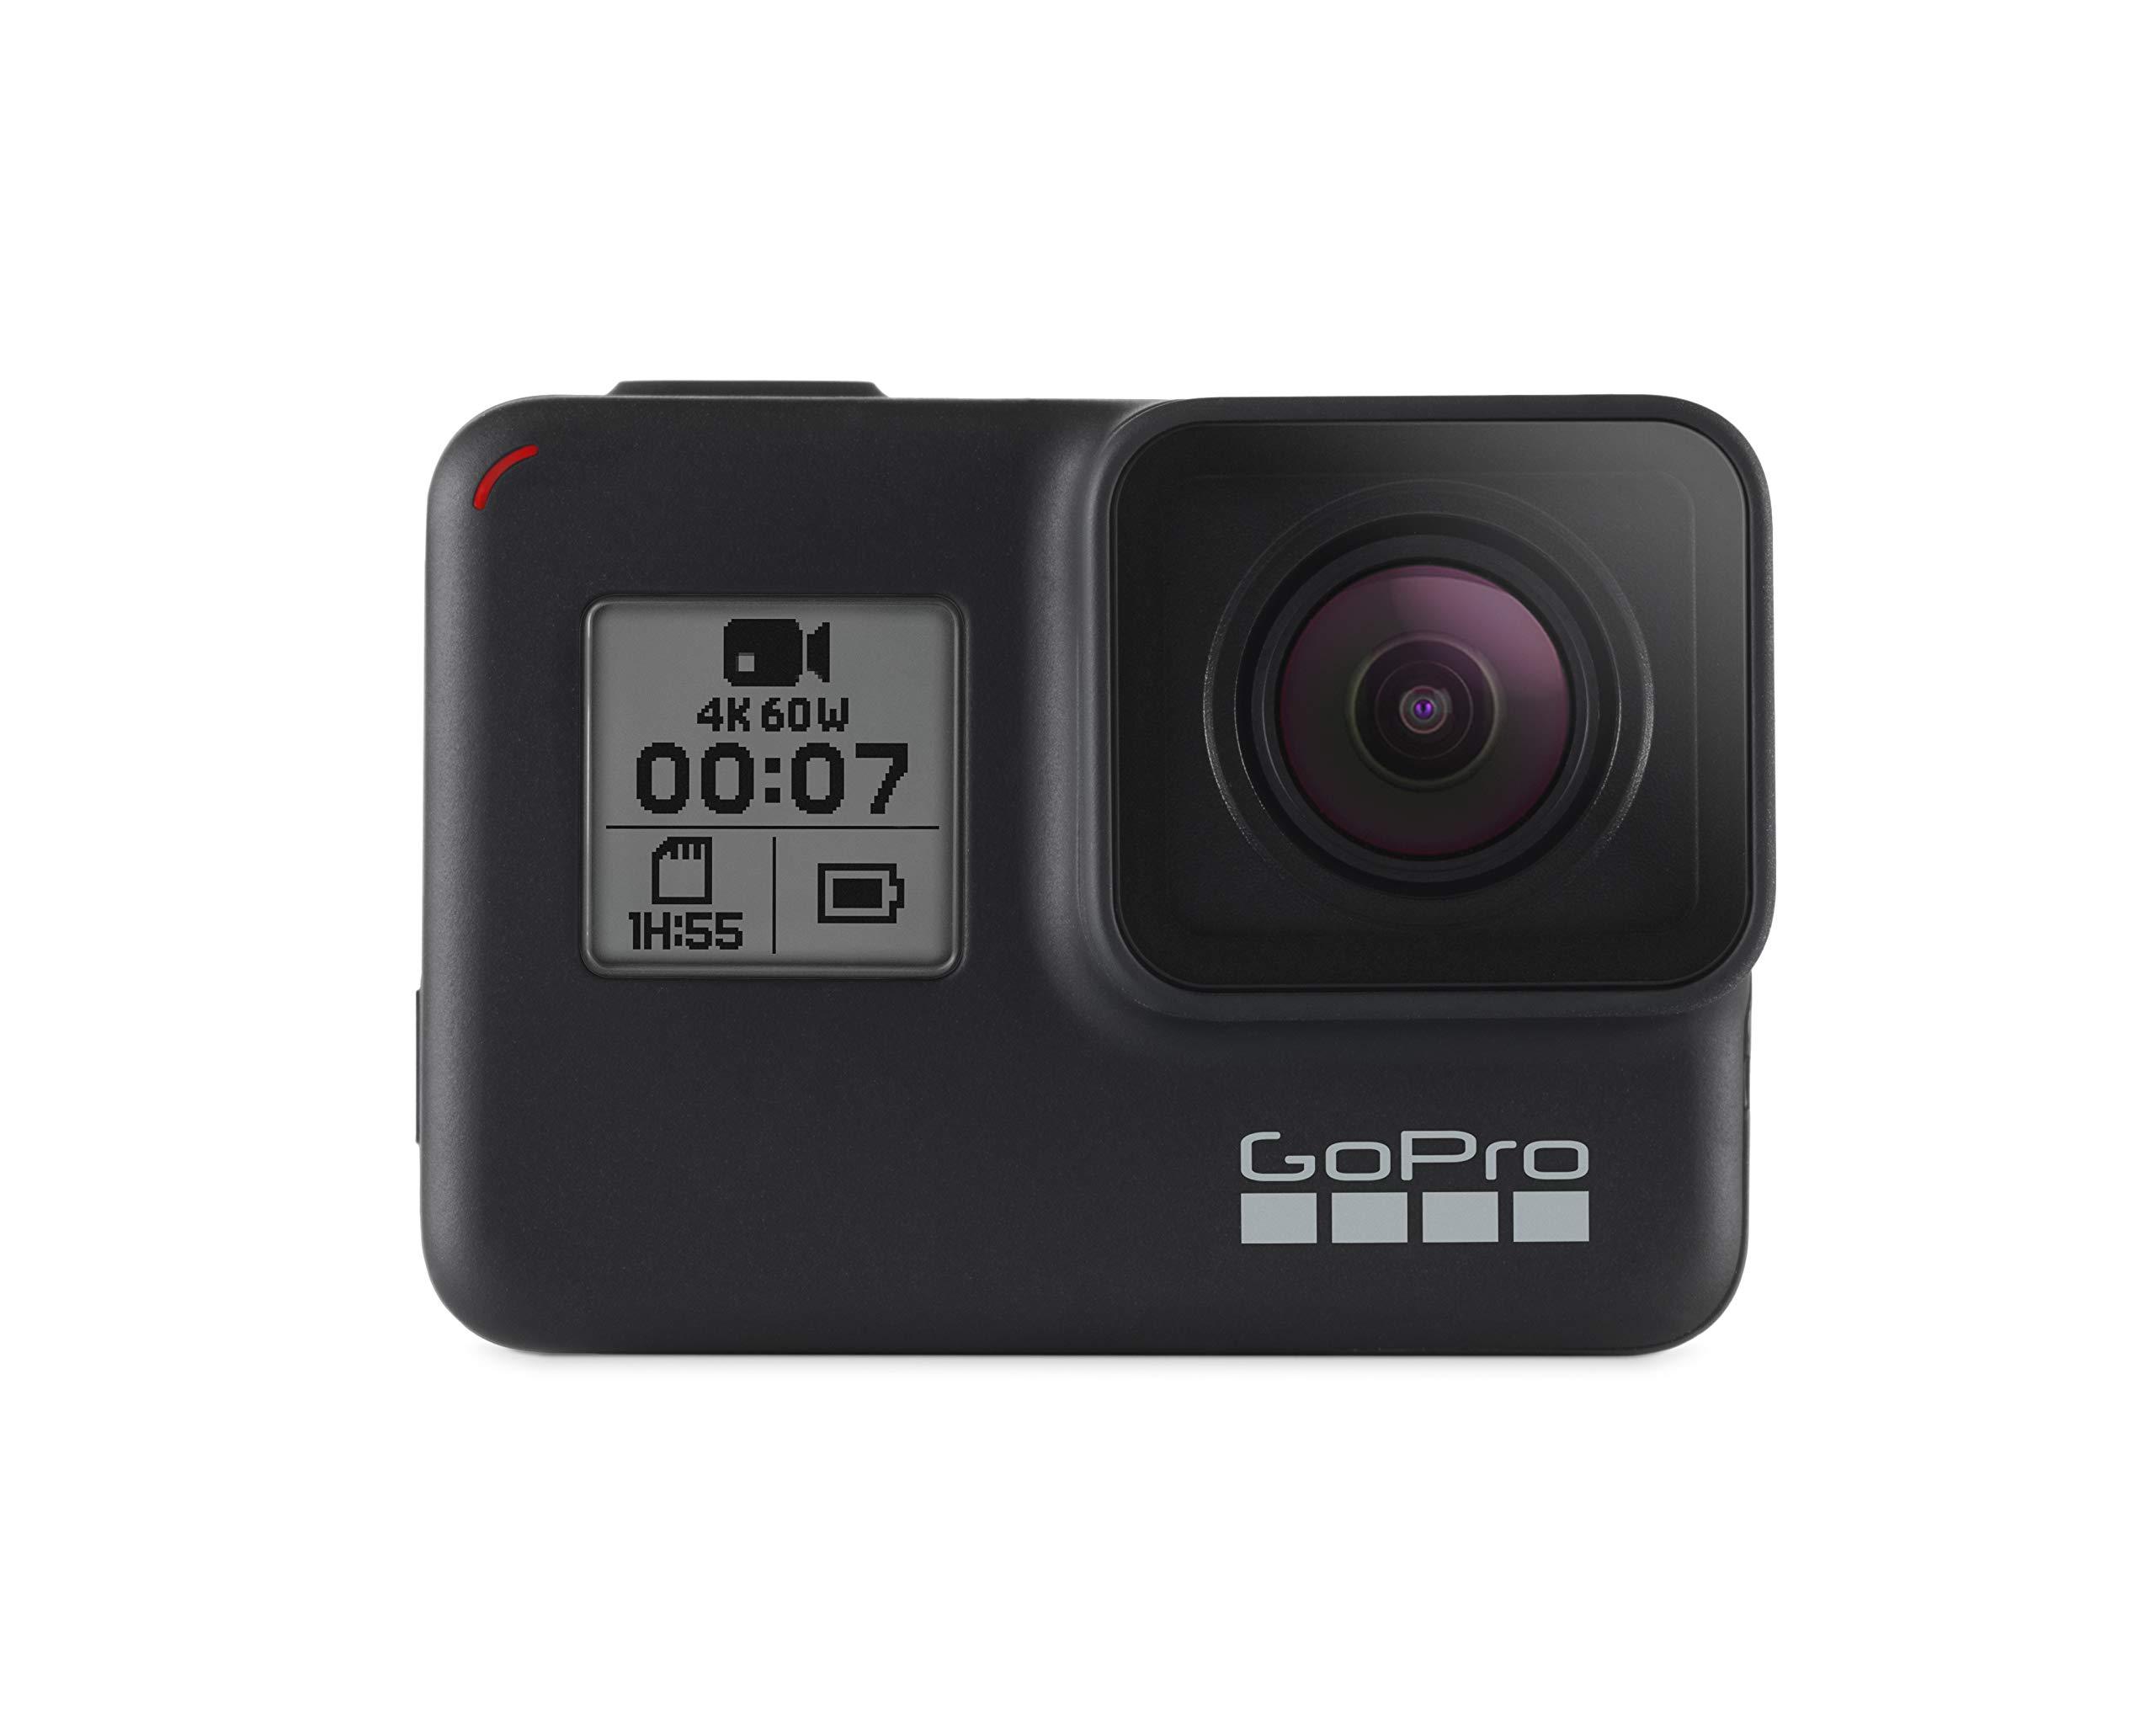 GoPro HERO 7 Black by GoPro